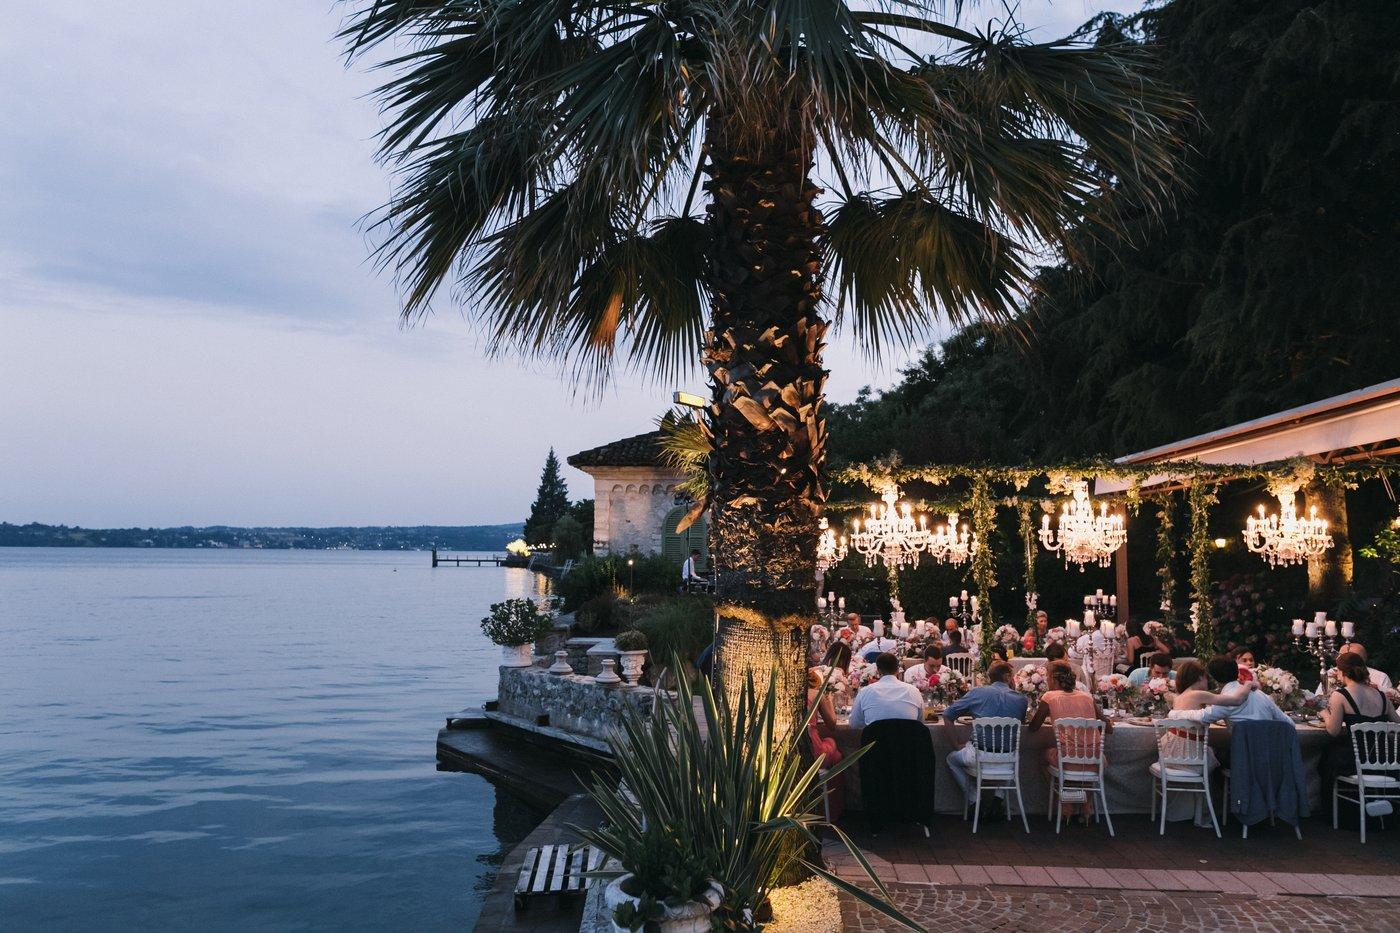 Anna Ilya July 12 2016 Garda lake Italy-Details Location-0071.jpg